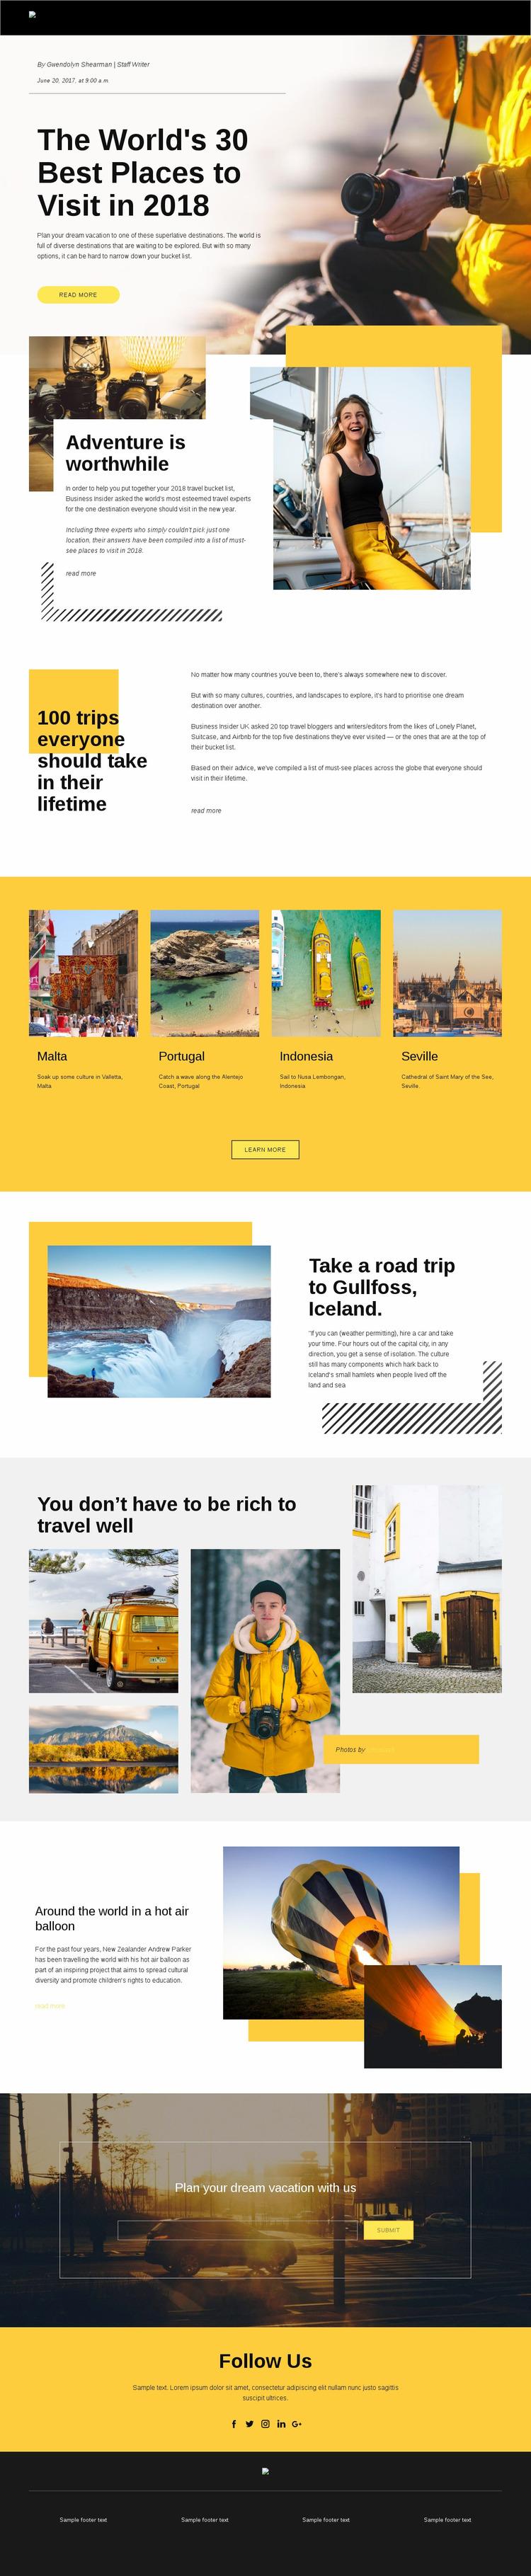 Best Places to Visit Website Mockup